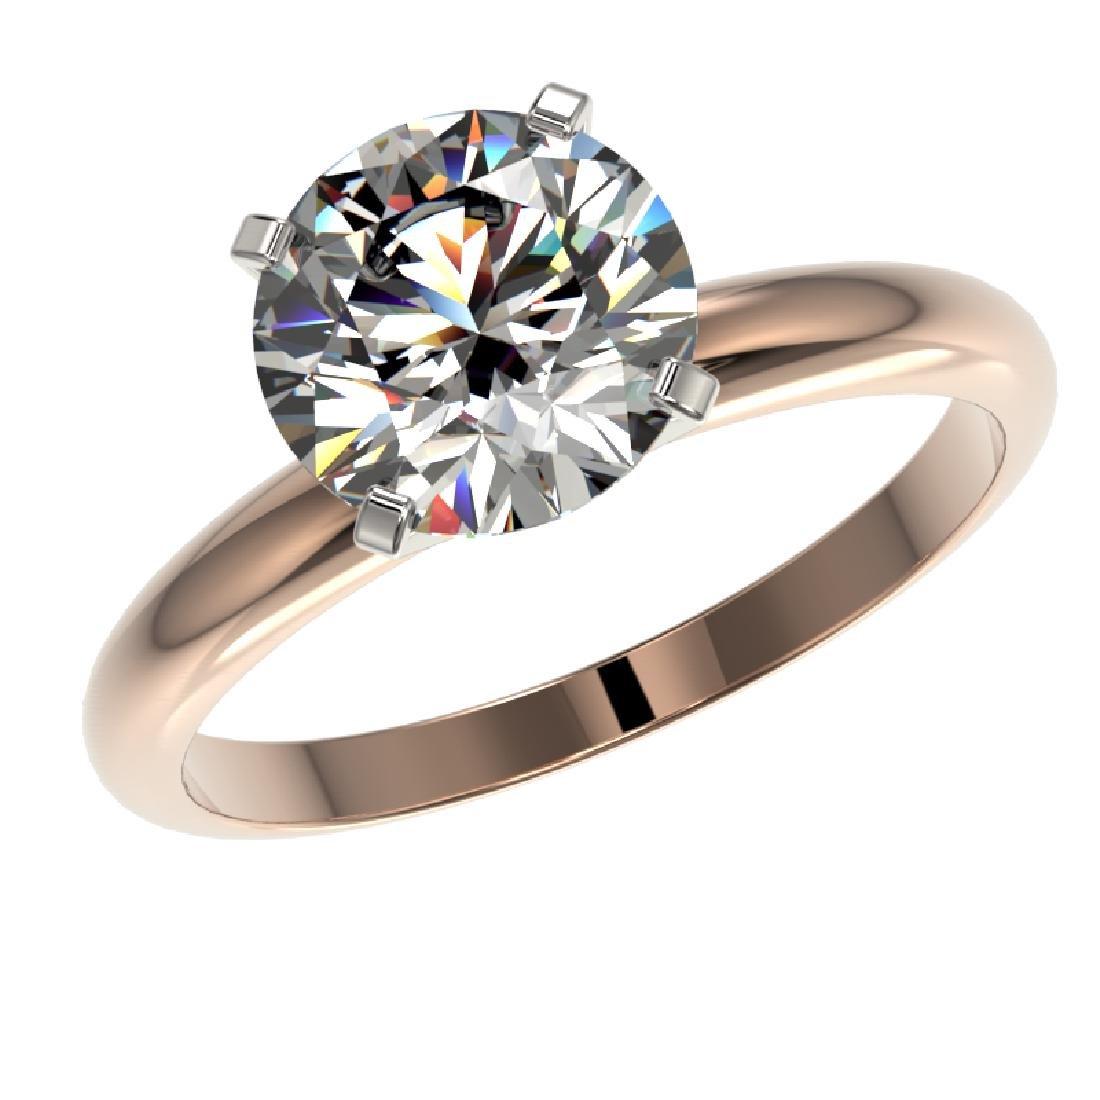 2.50 CTW Certified G-SI Diamond Engagement Ring 10K - 2